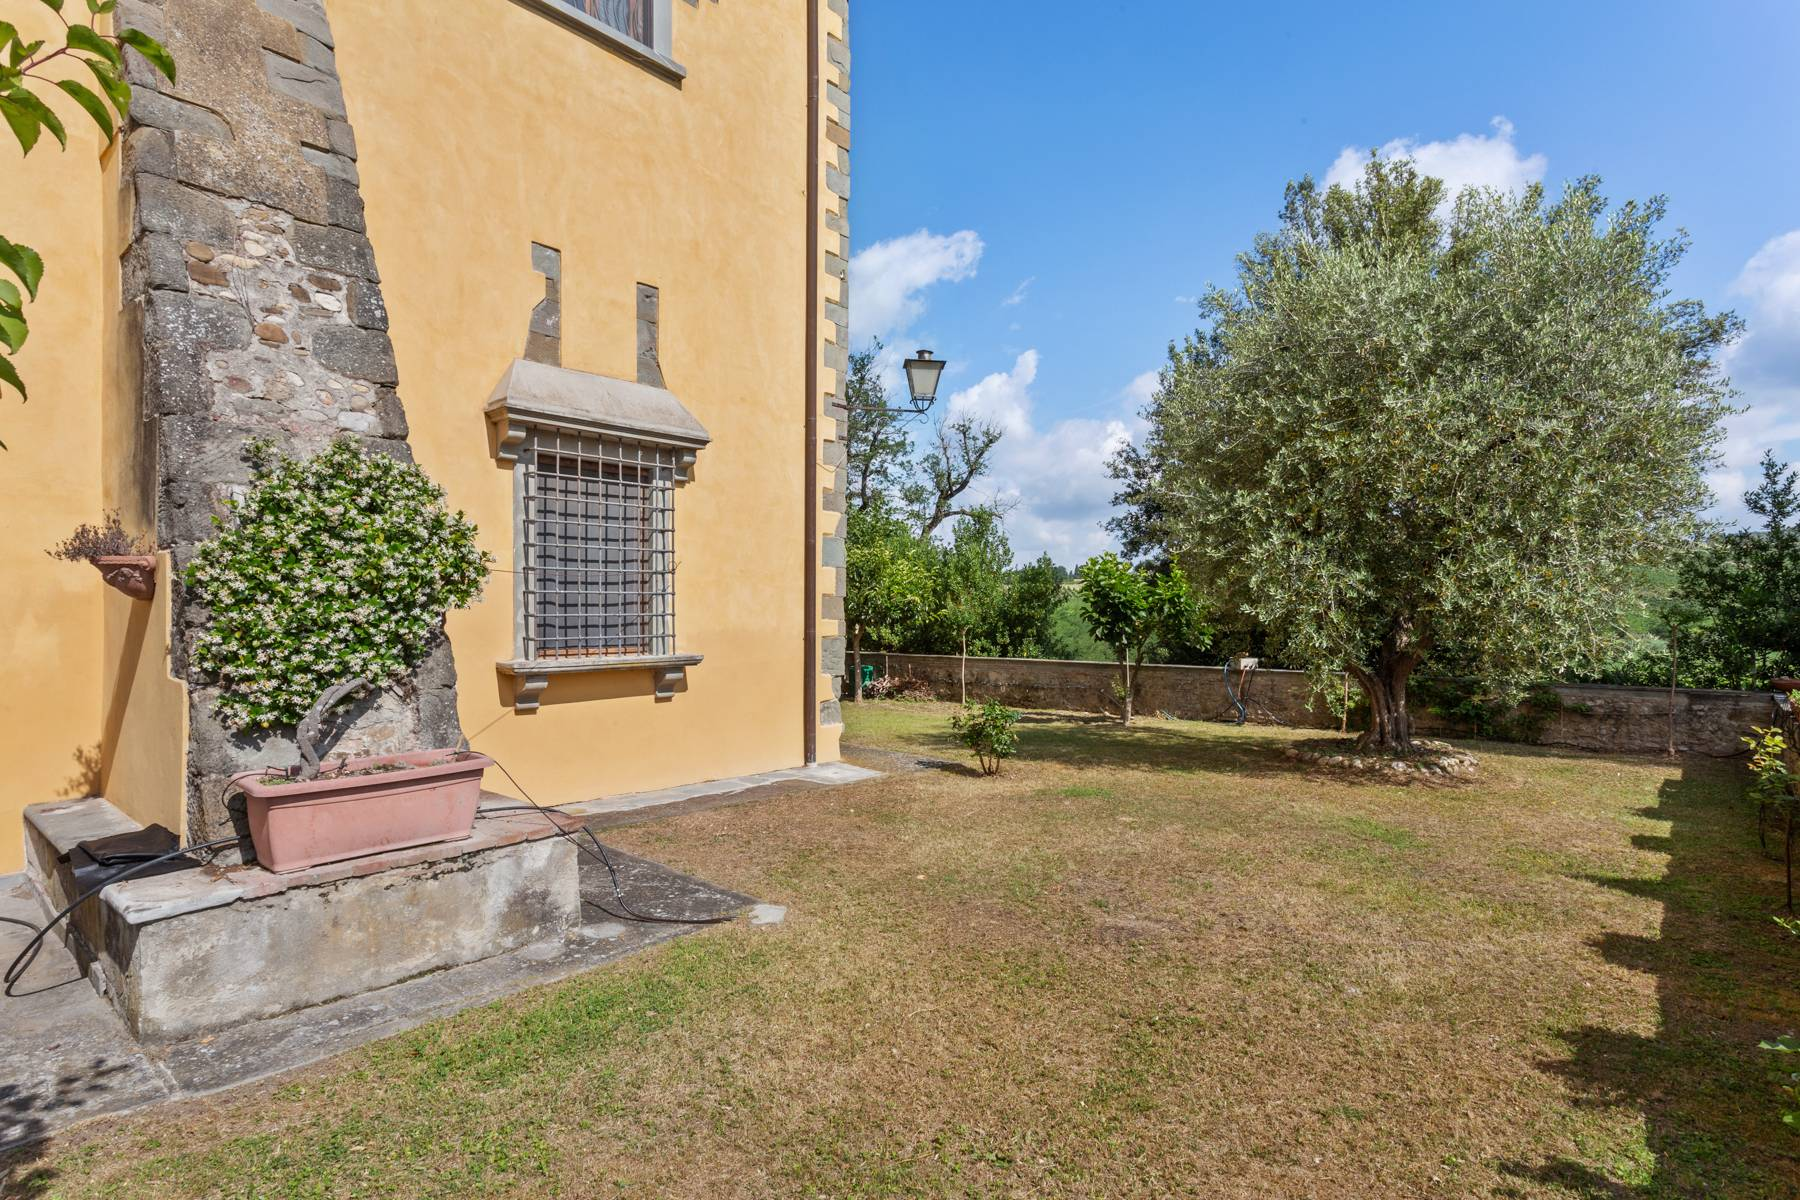 Appartamento in Vendita a Scandicci: 5 locali, 140 mq - Foto 10